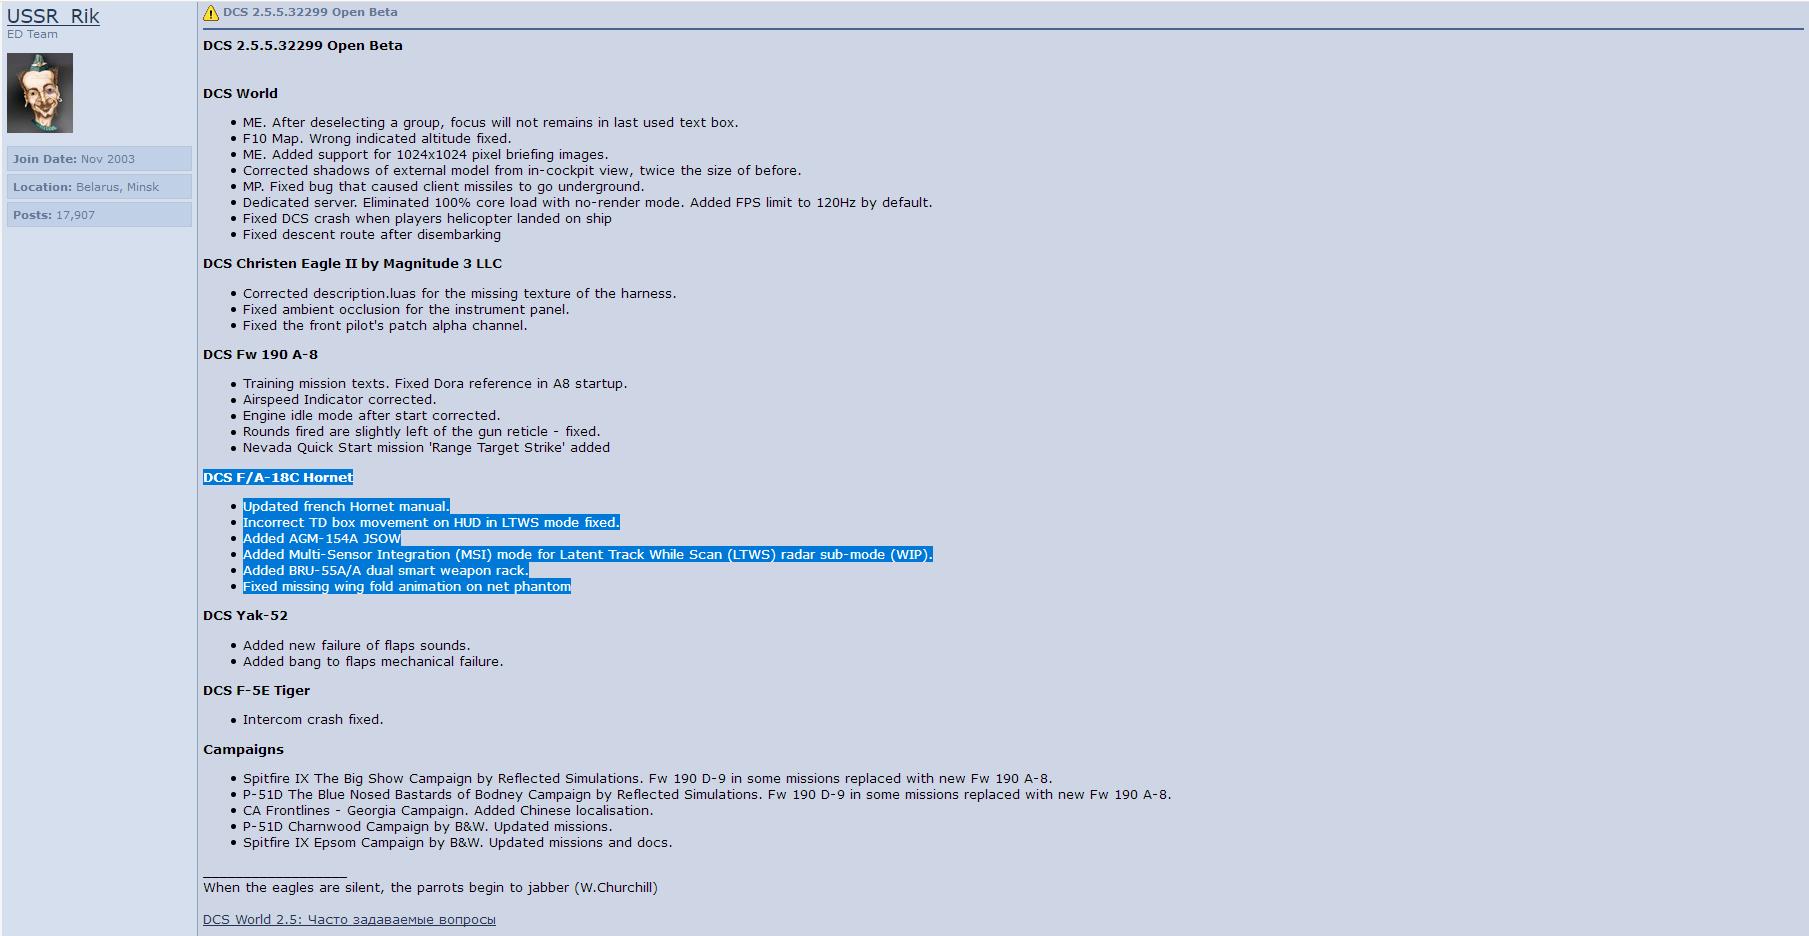 DCS 2.5.5.32299 Open Beta